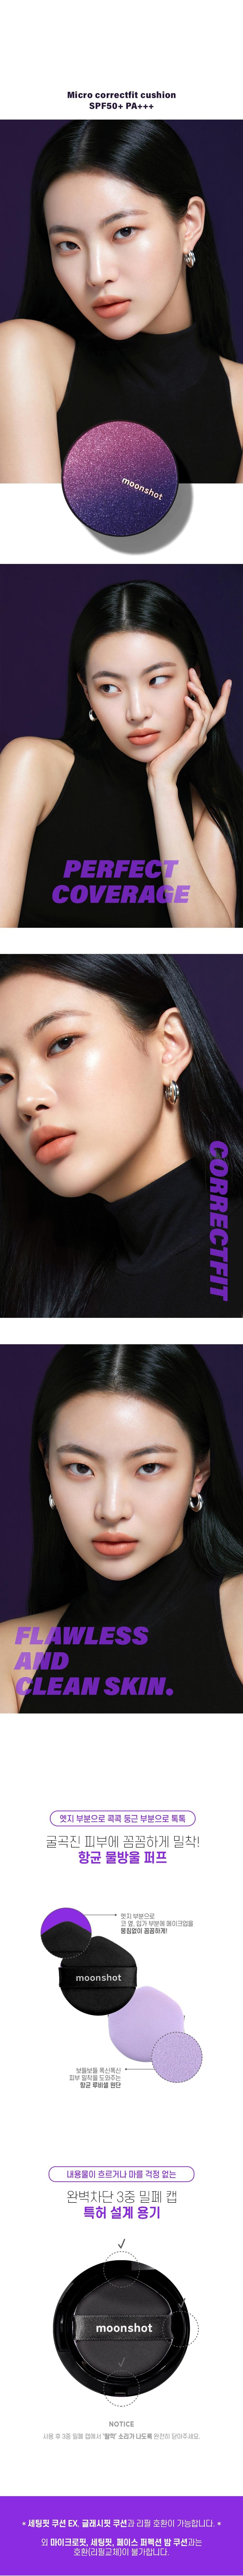 Moonshot Micro Correct Fit Cushion SPF50+ PA+++ 15g + 15g refill korean skincare product online shop malaysia China macau3